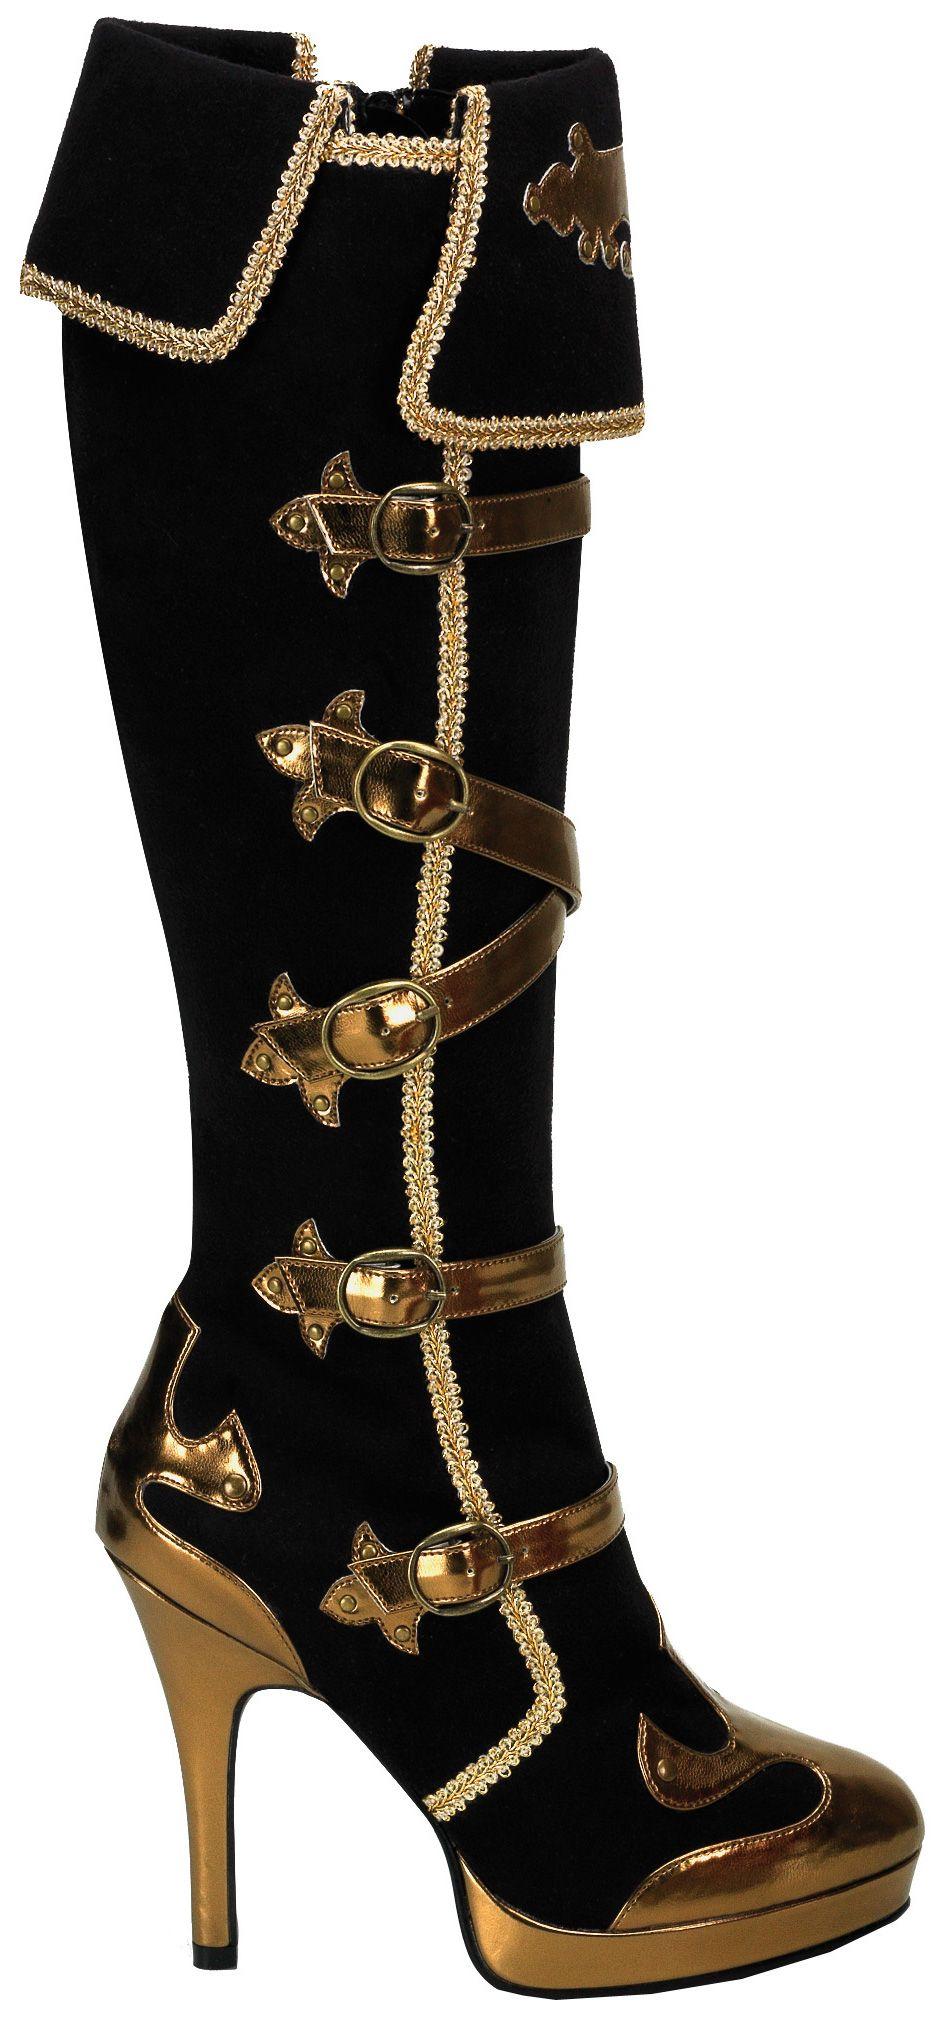 Negro Pirata Botas Traje Zapatos Tamaño 7